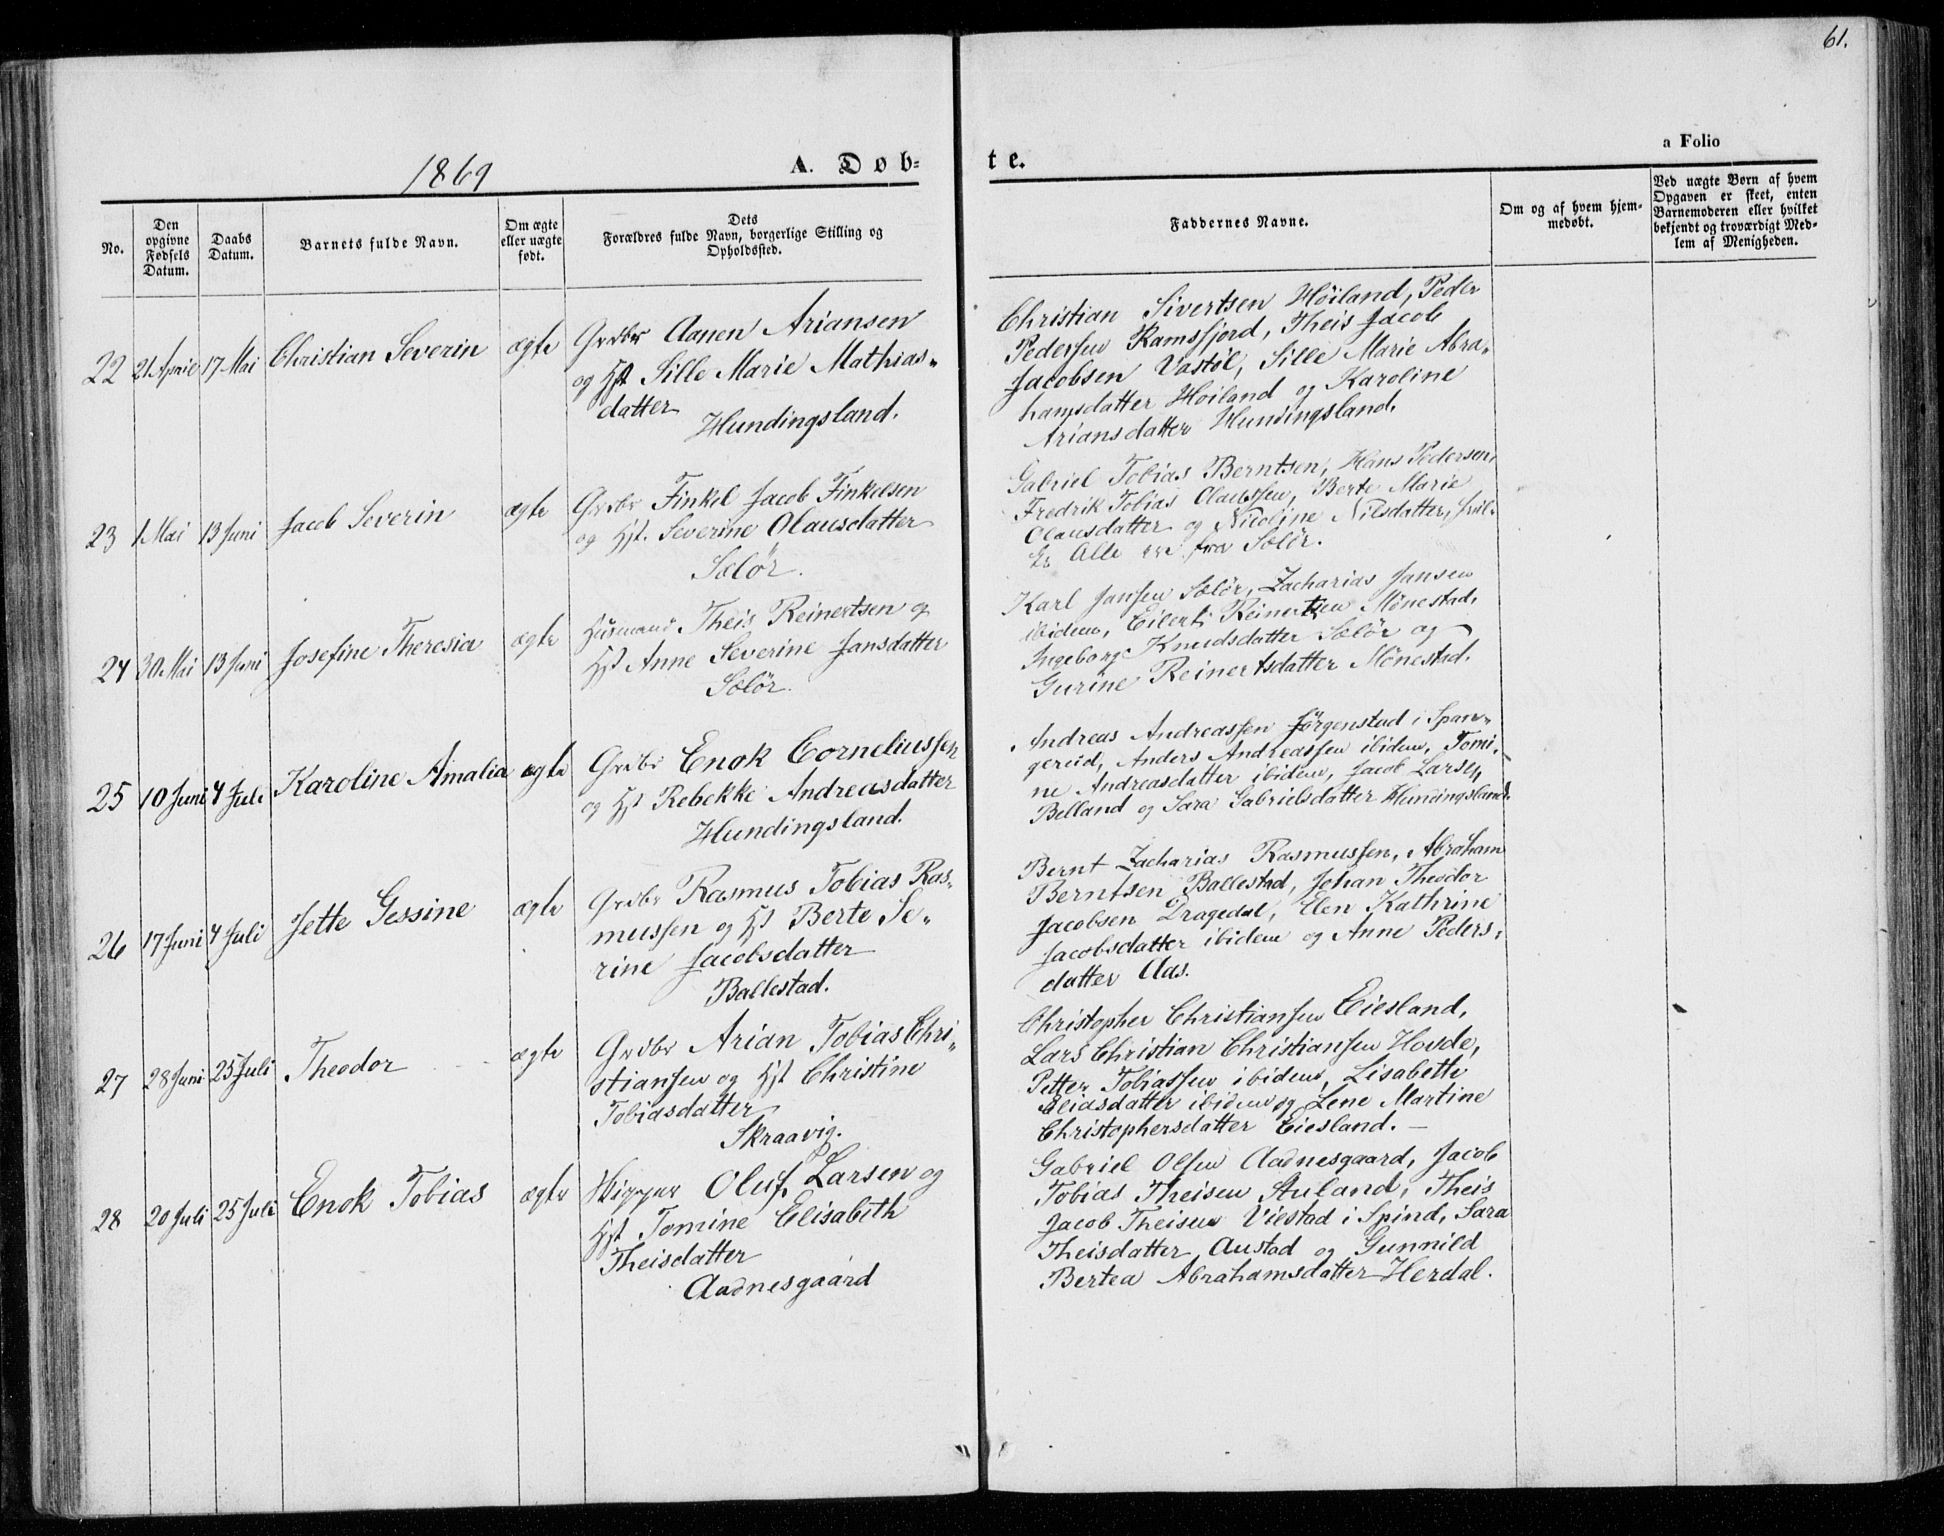 SAK, Lyngdal sokneprestkontor, F/Fa/Faa/L0002: Ministerialbok nr. A 2, 1858-1870, s. 61